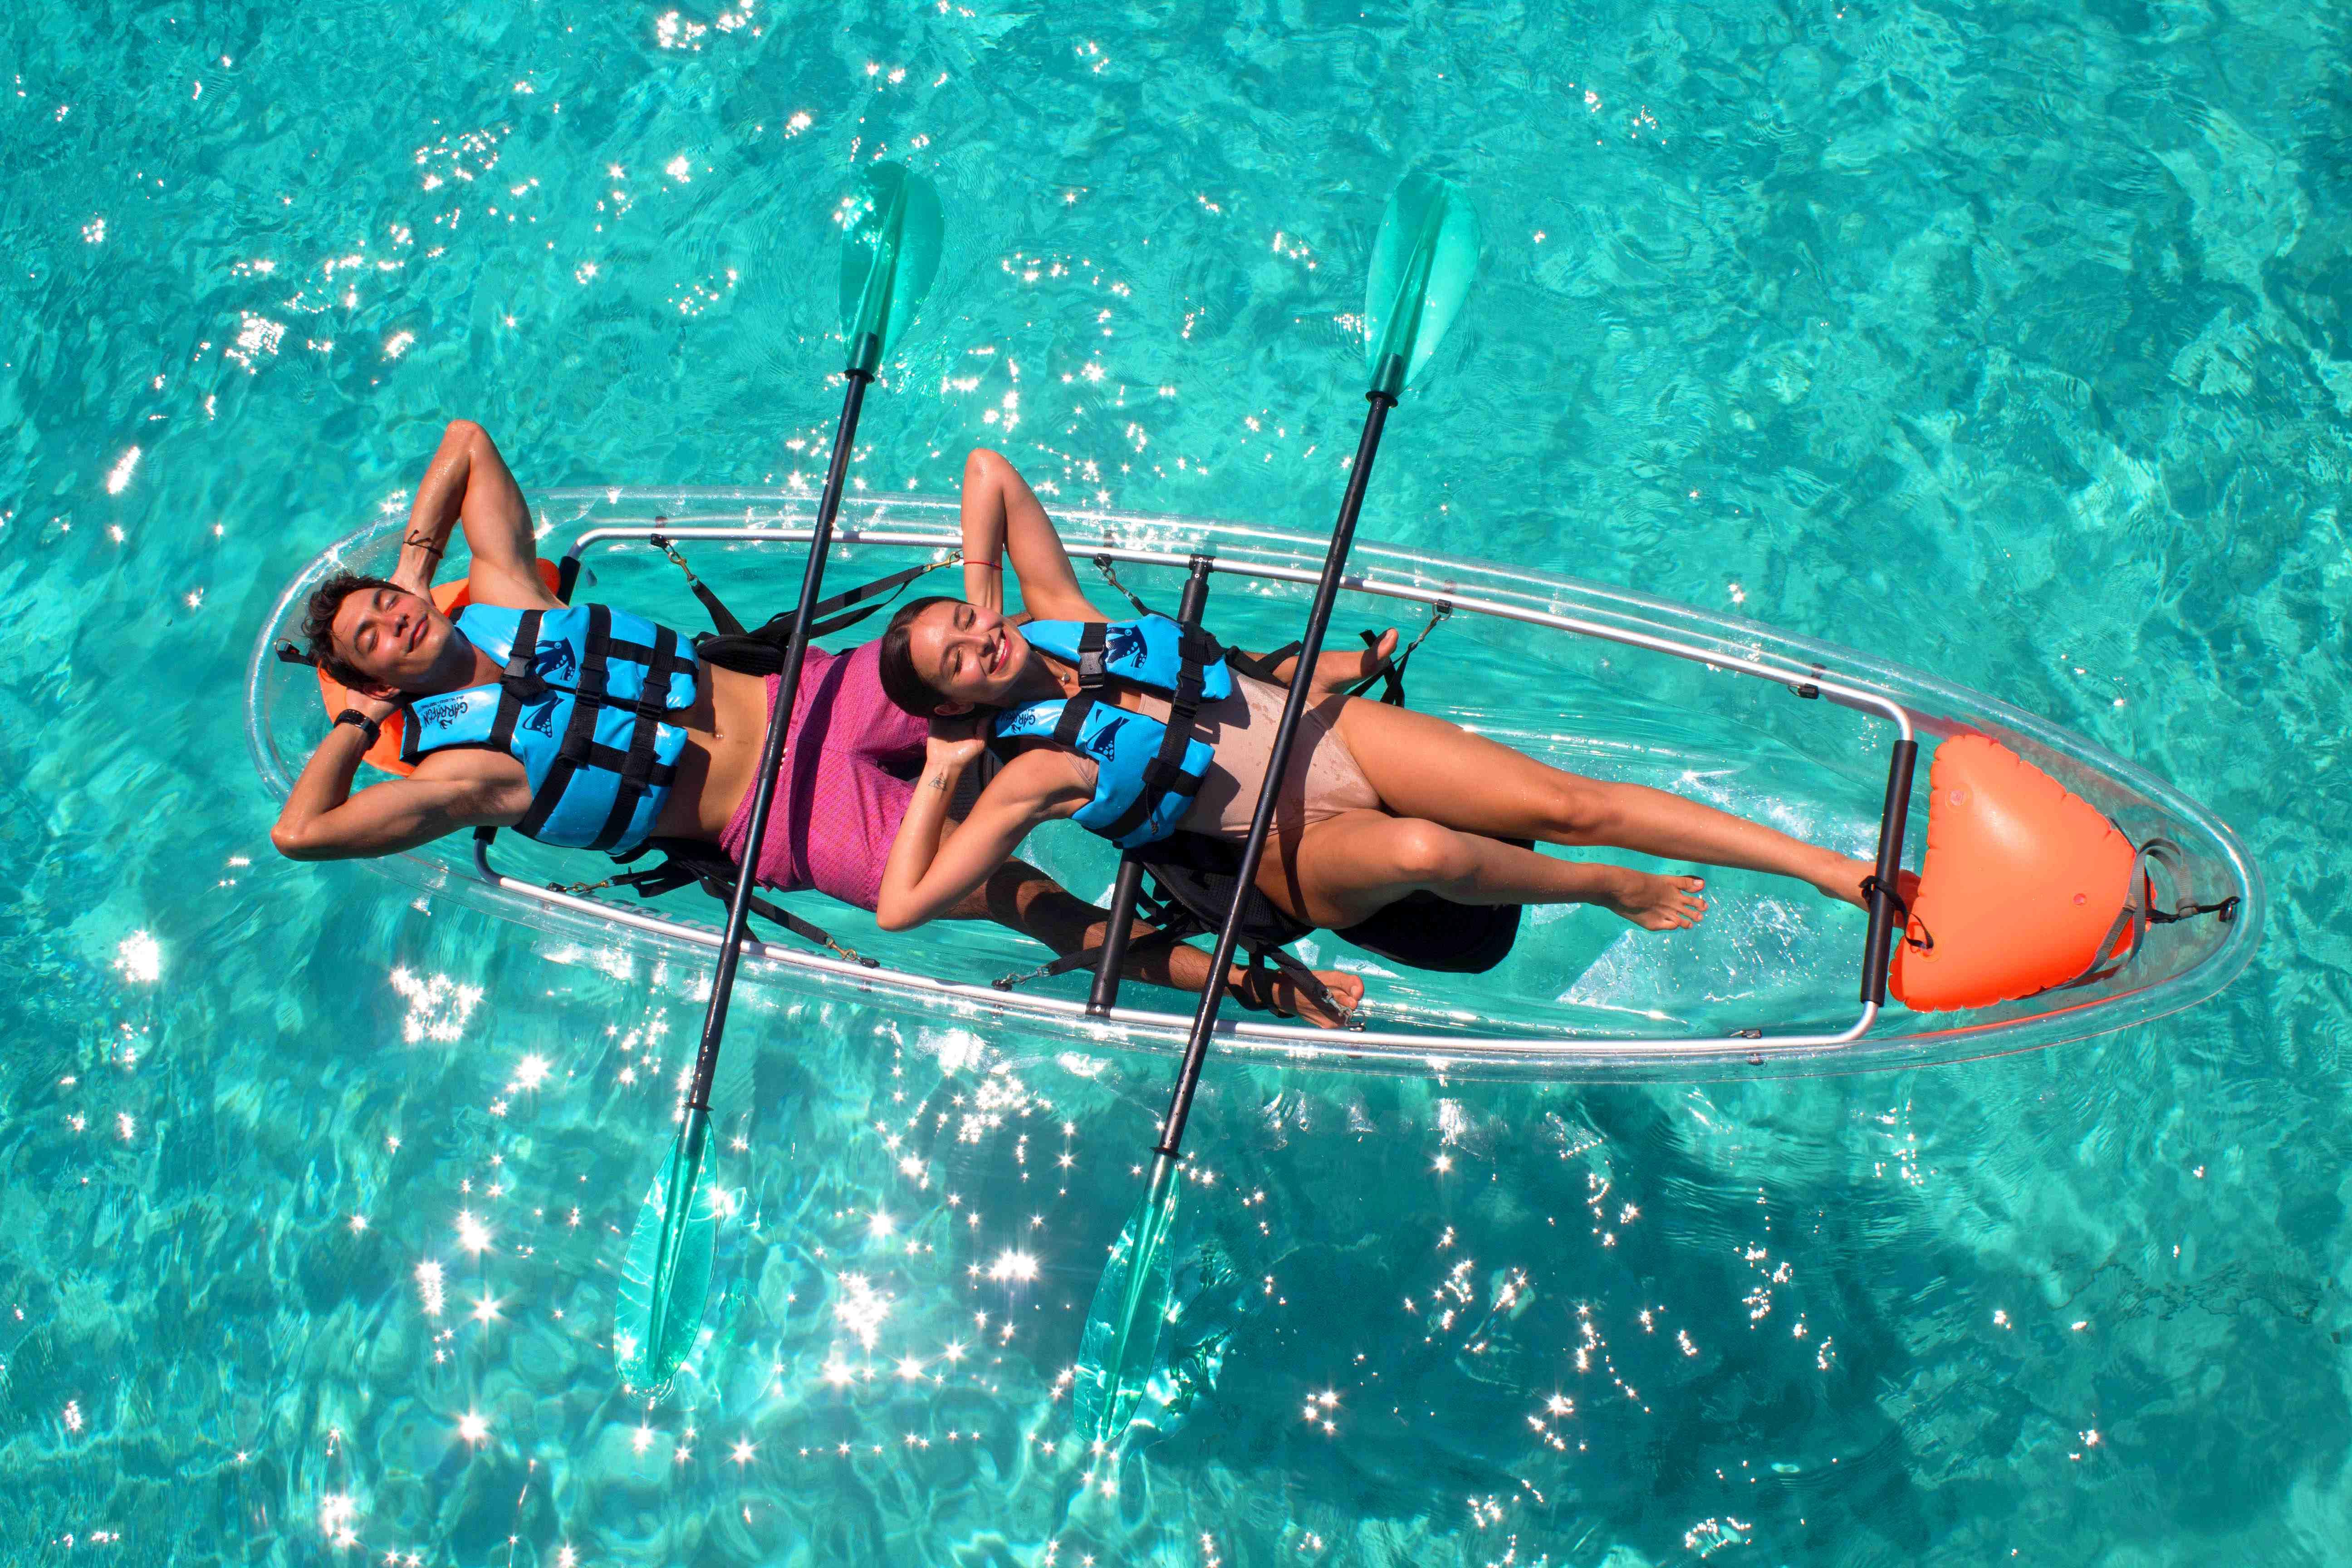 Royal Garrafon Basic - Last Minute Tours in Cancún and Riviera Maya